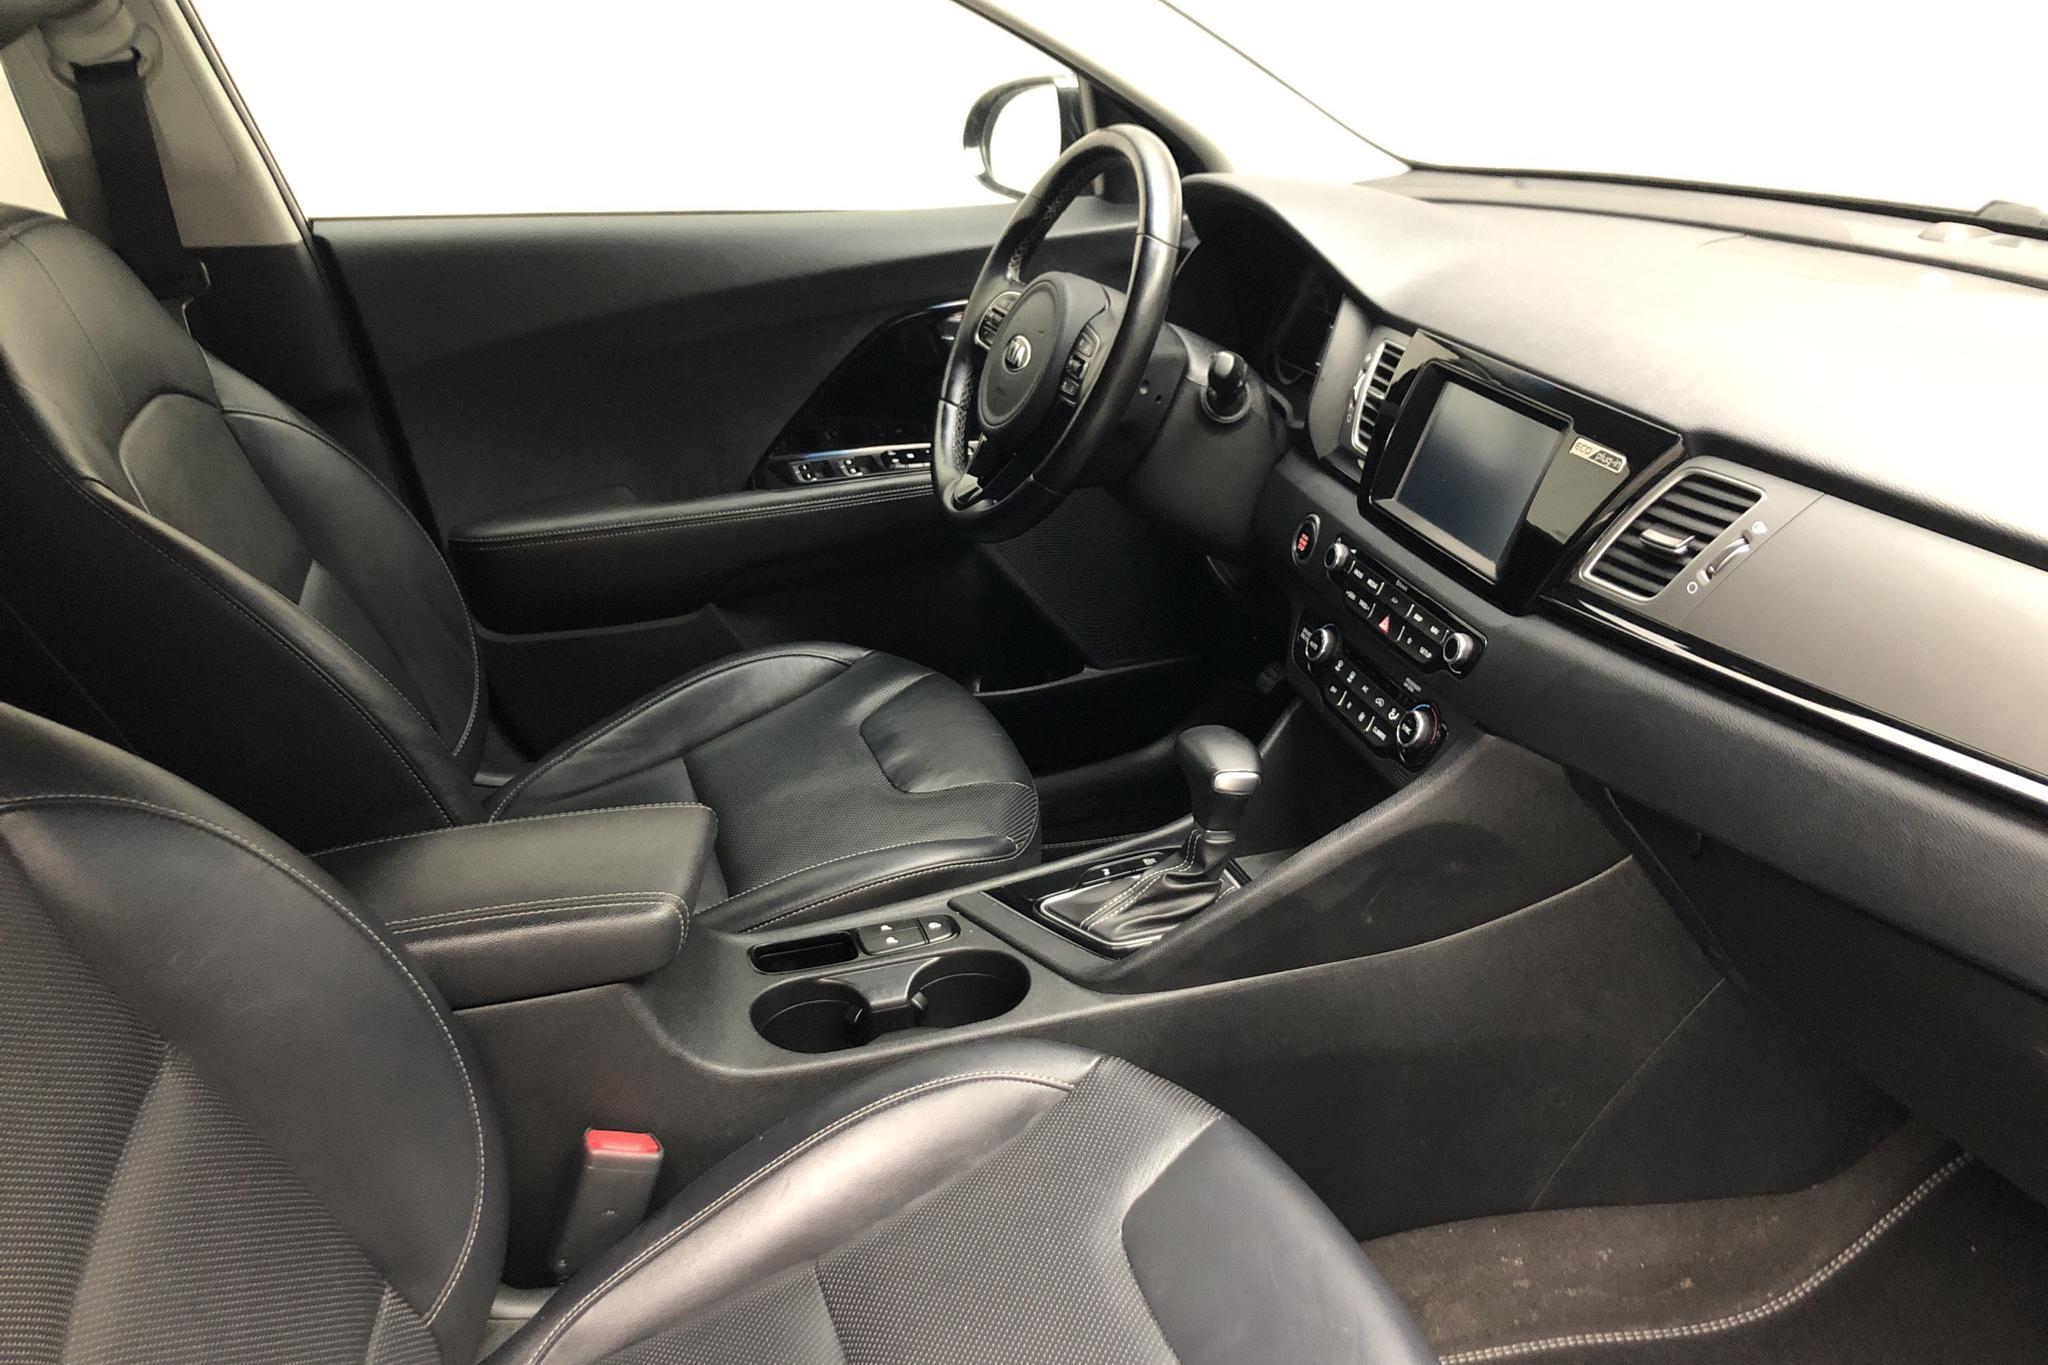 KIA Niro Plug-in Hybrid 1.6 (141hk) - 48 090 km - Automatic - black - 2018